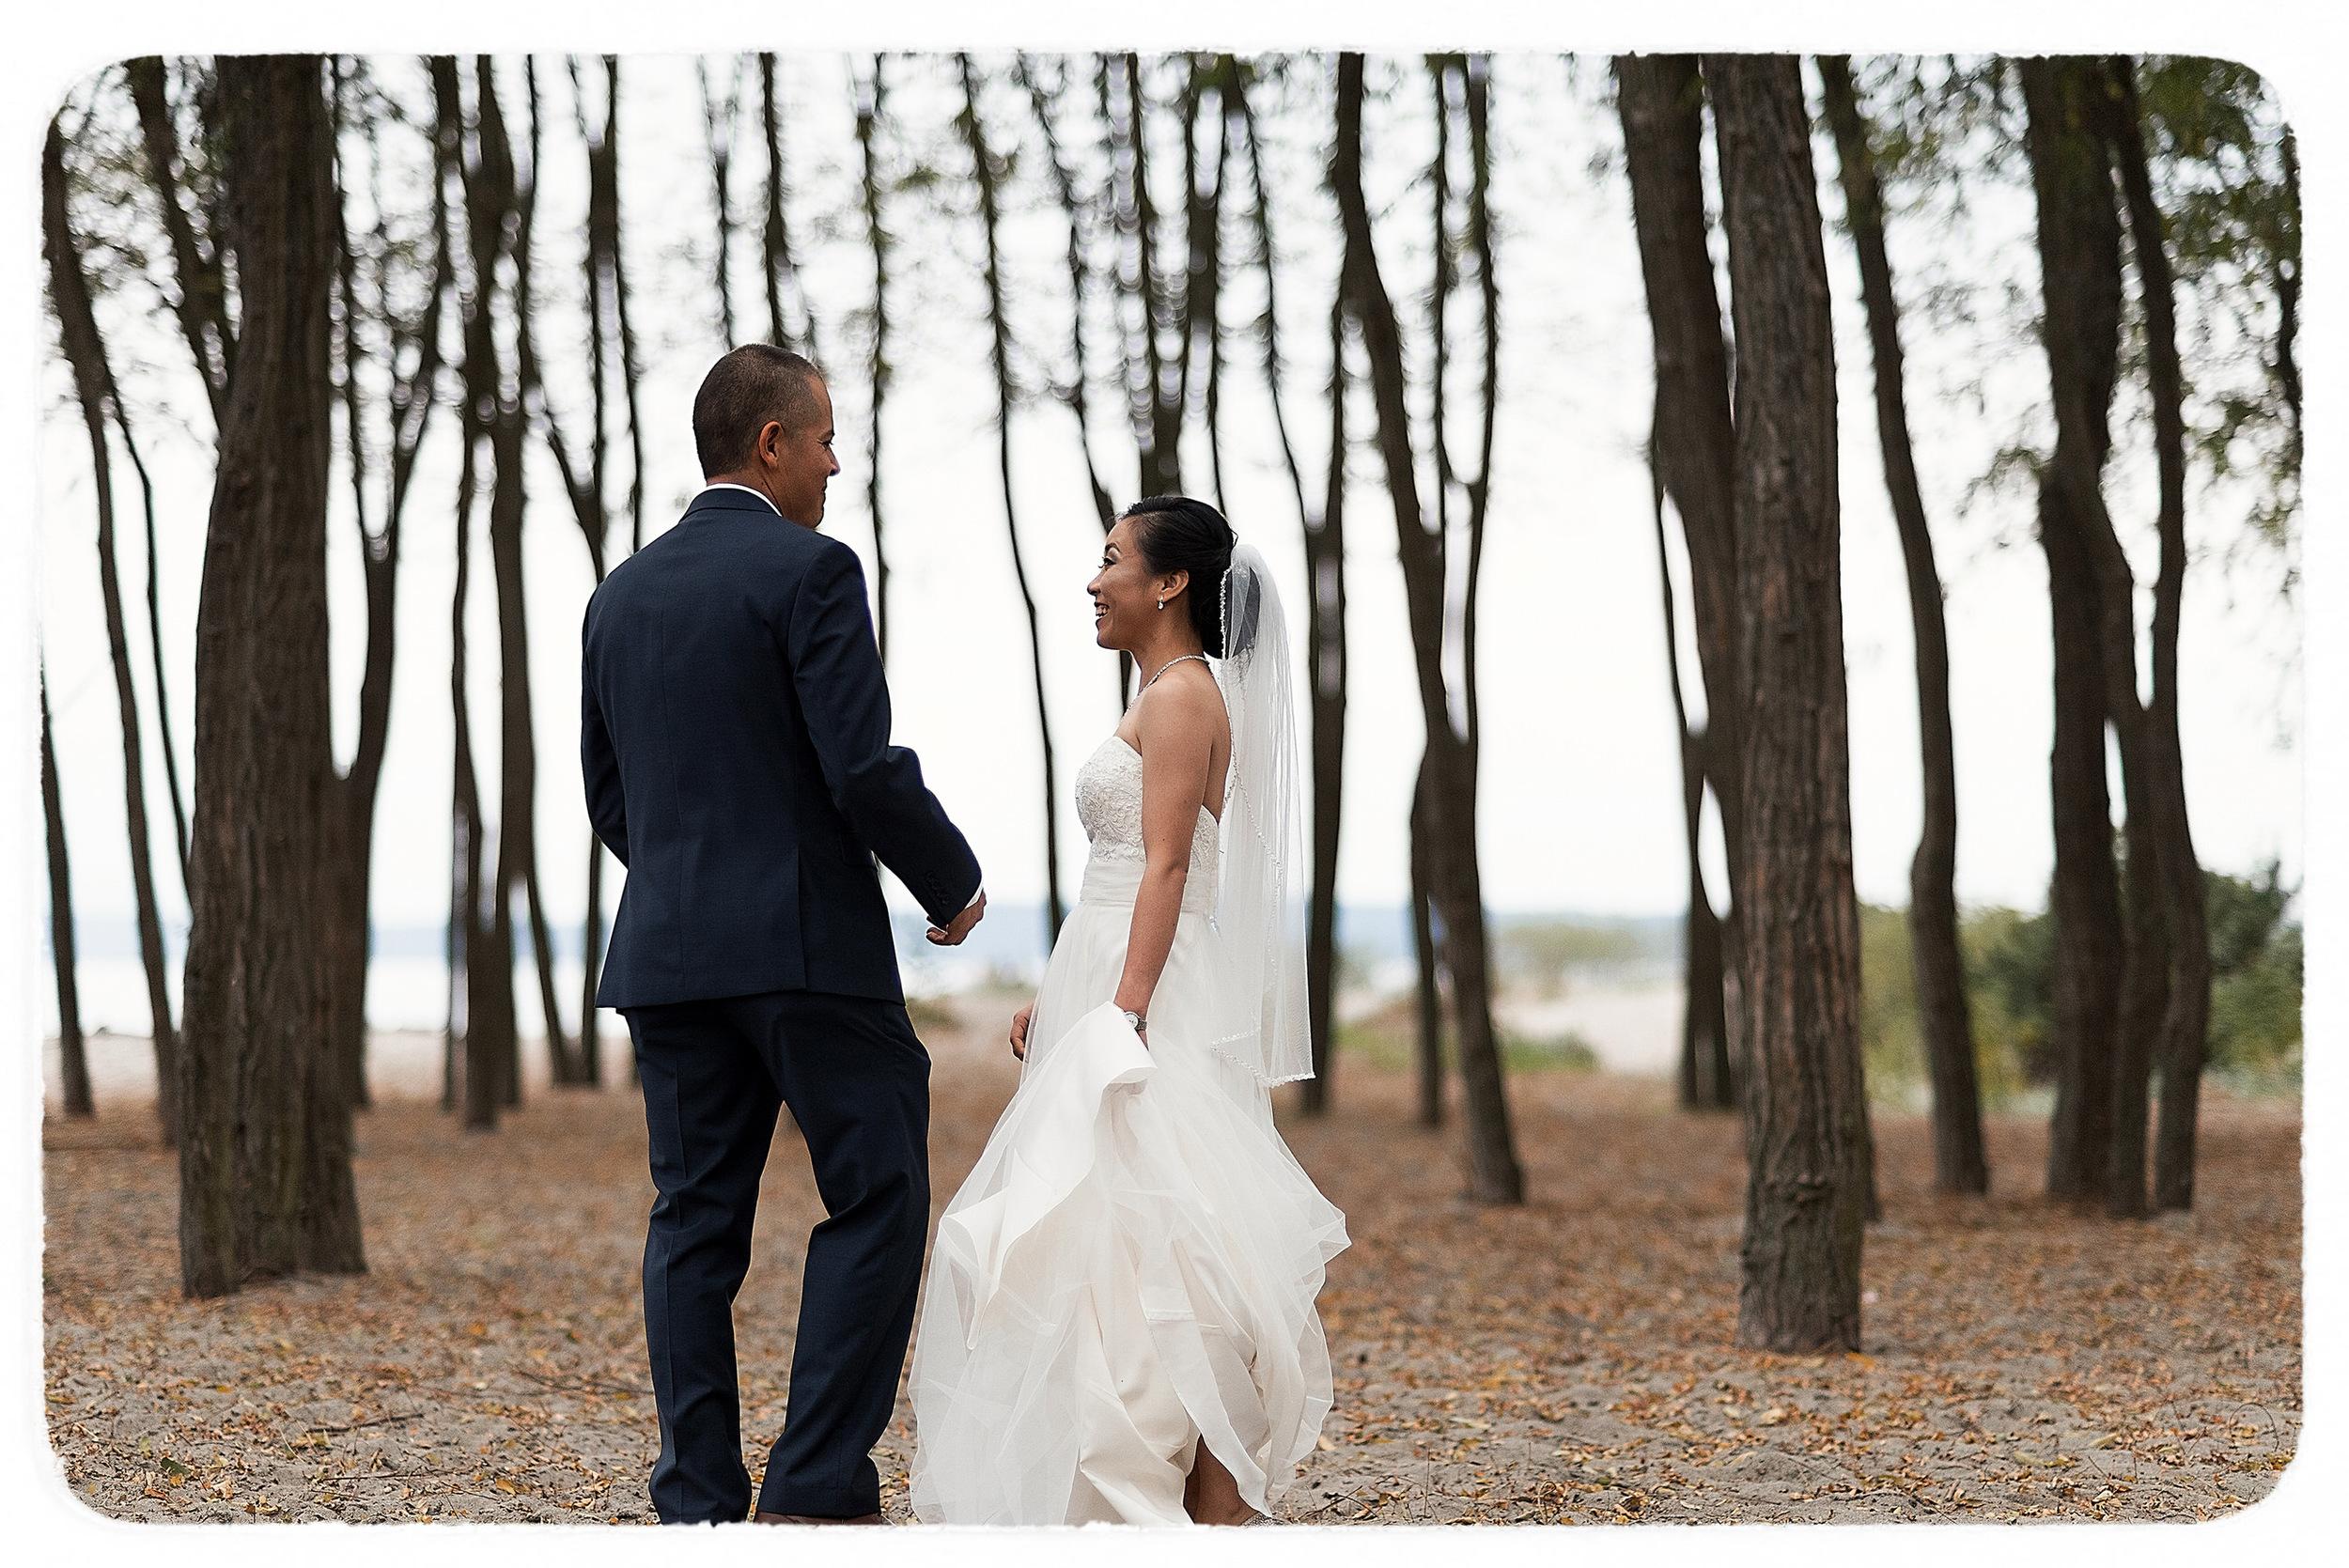 Kate&Jose-Wedding-OriginalCollection-105Film.jpg